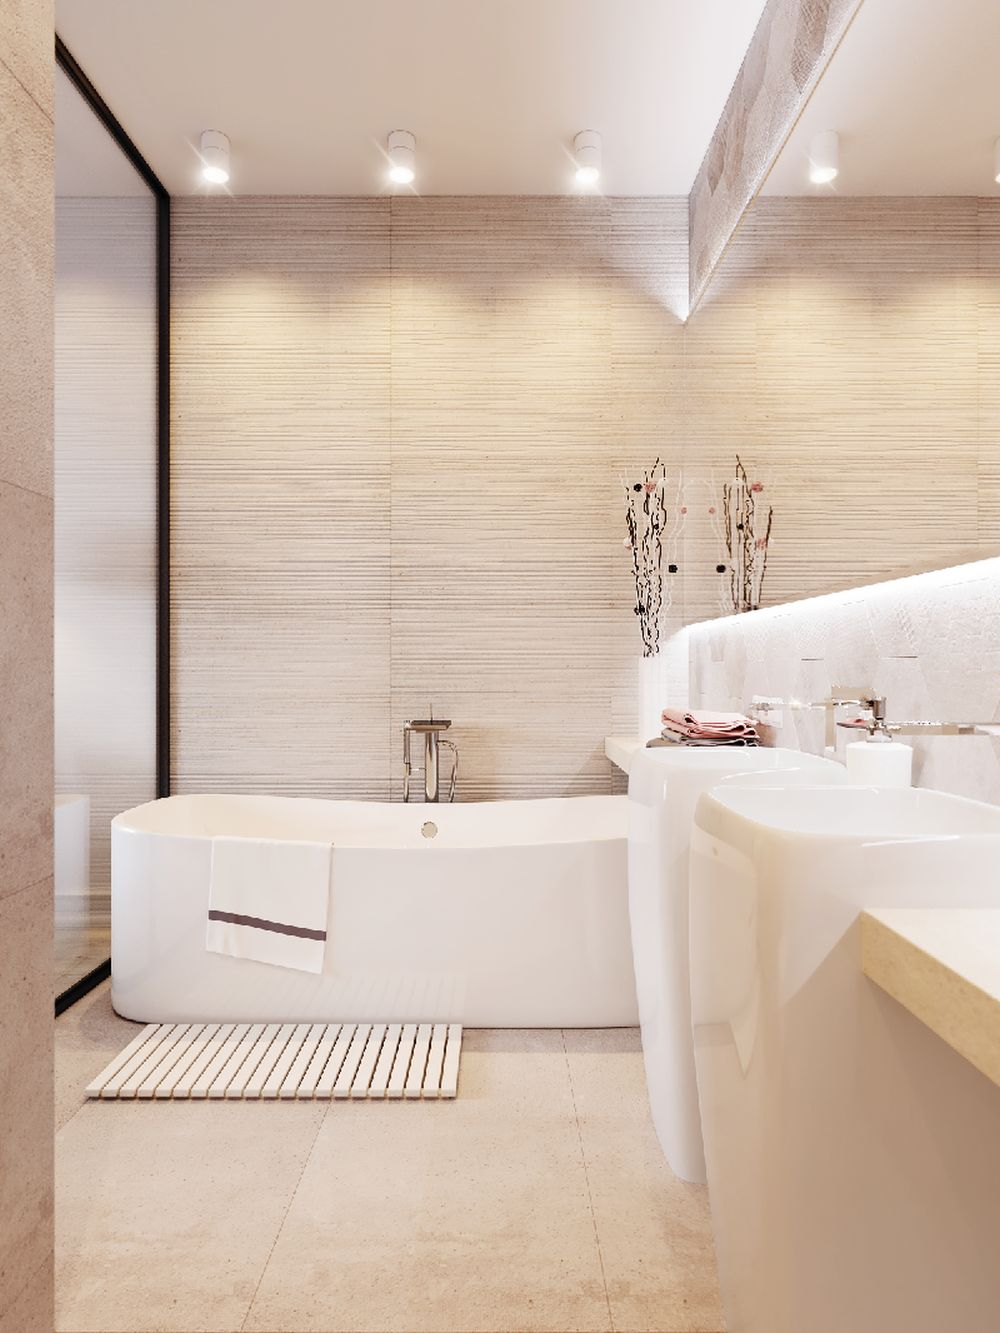 adelaparvu.com despre apartament in nuante delicate, designer Dima Kravtsov (17)